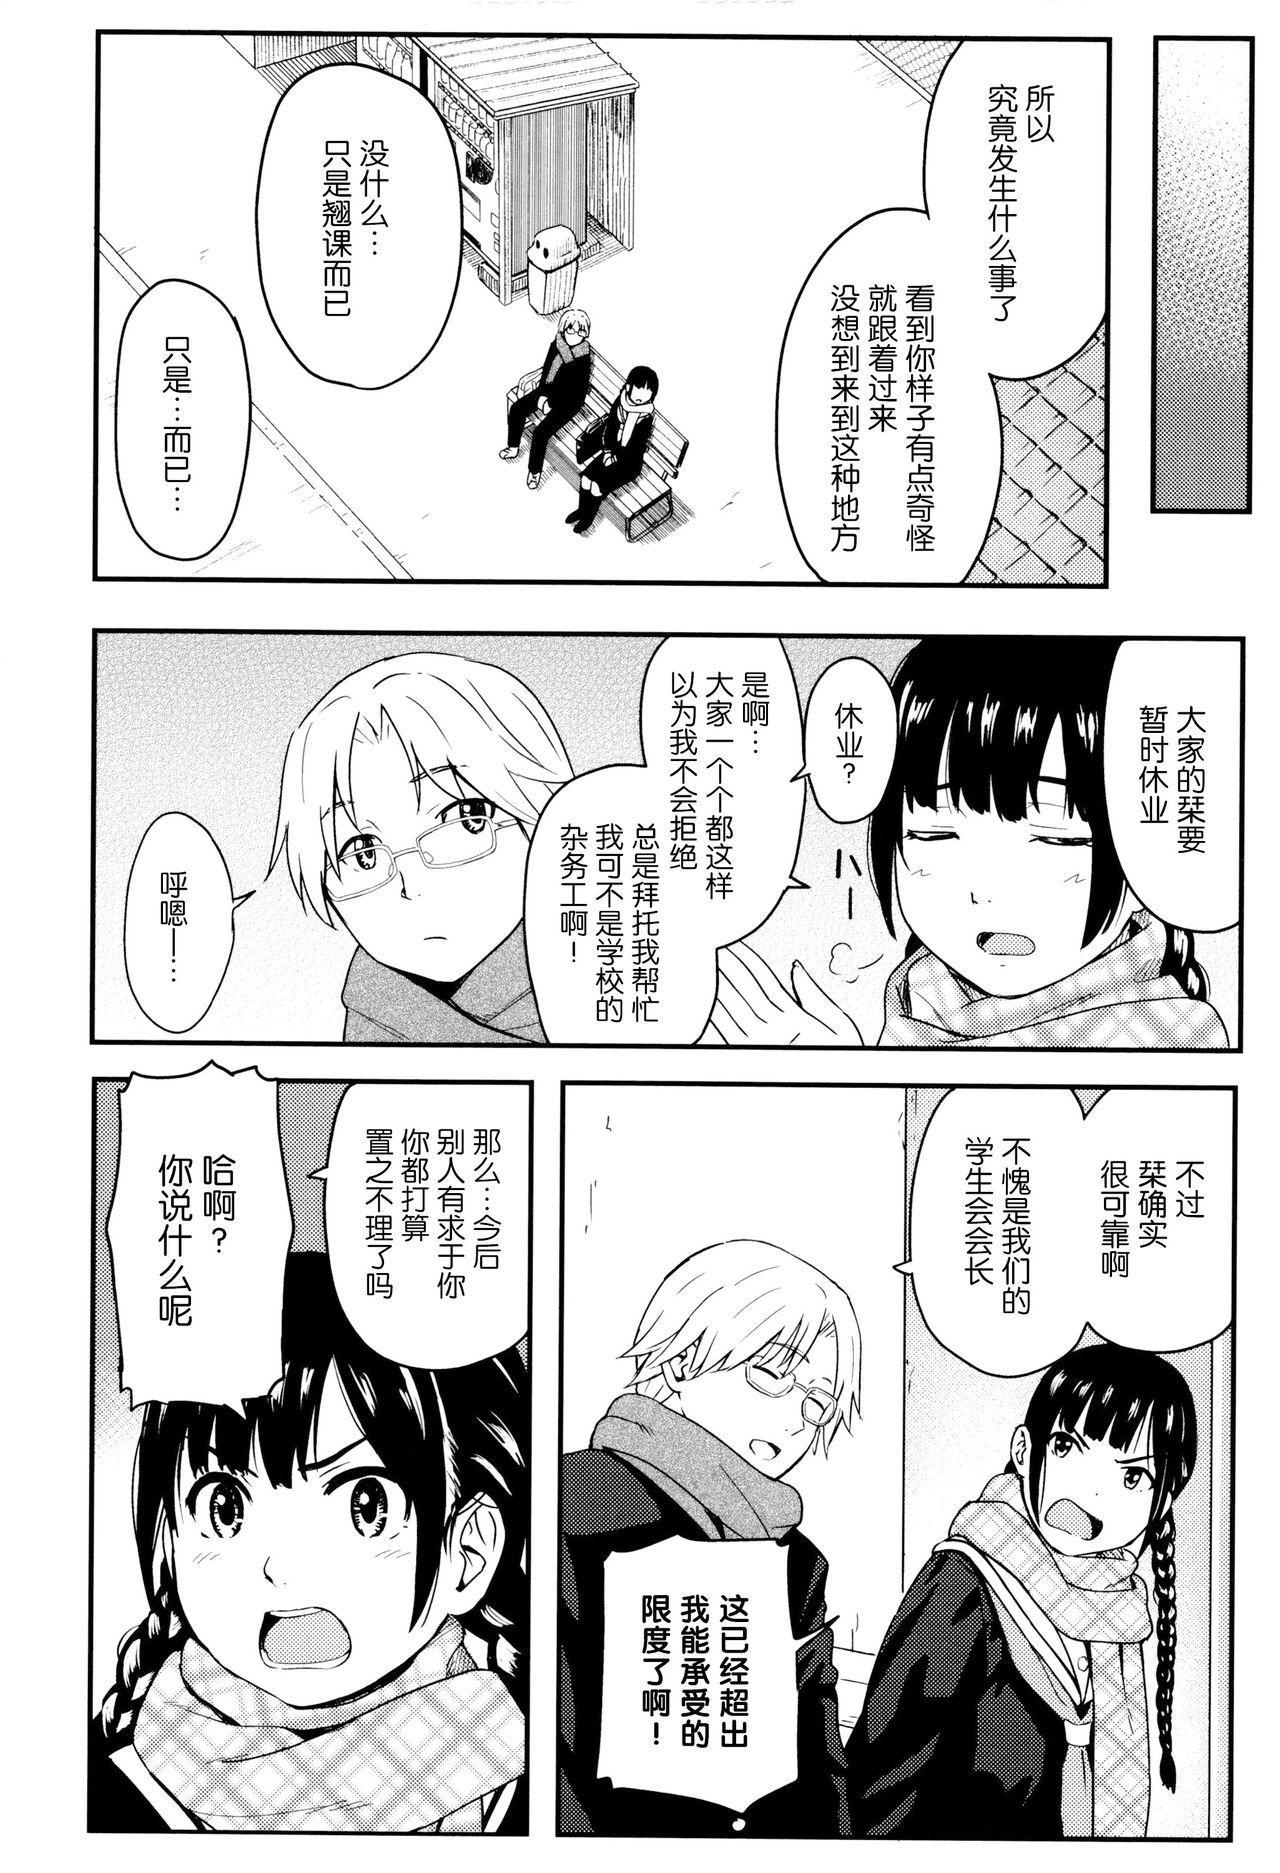 Tokubetsu na Mainichi - Special daily 94